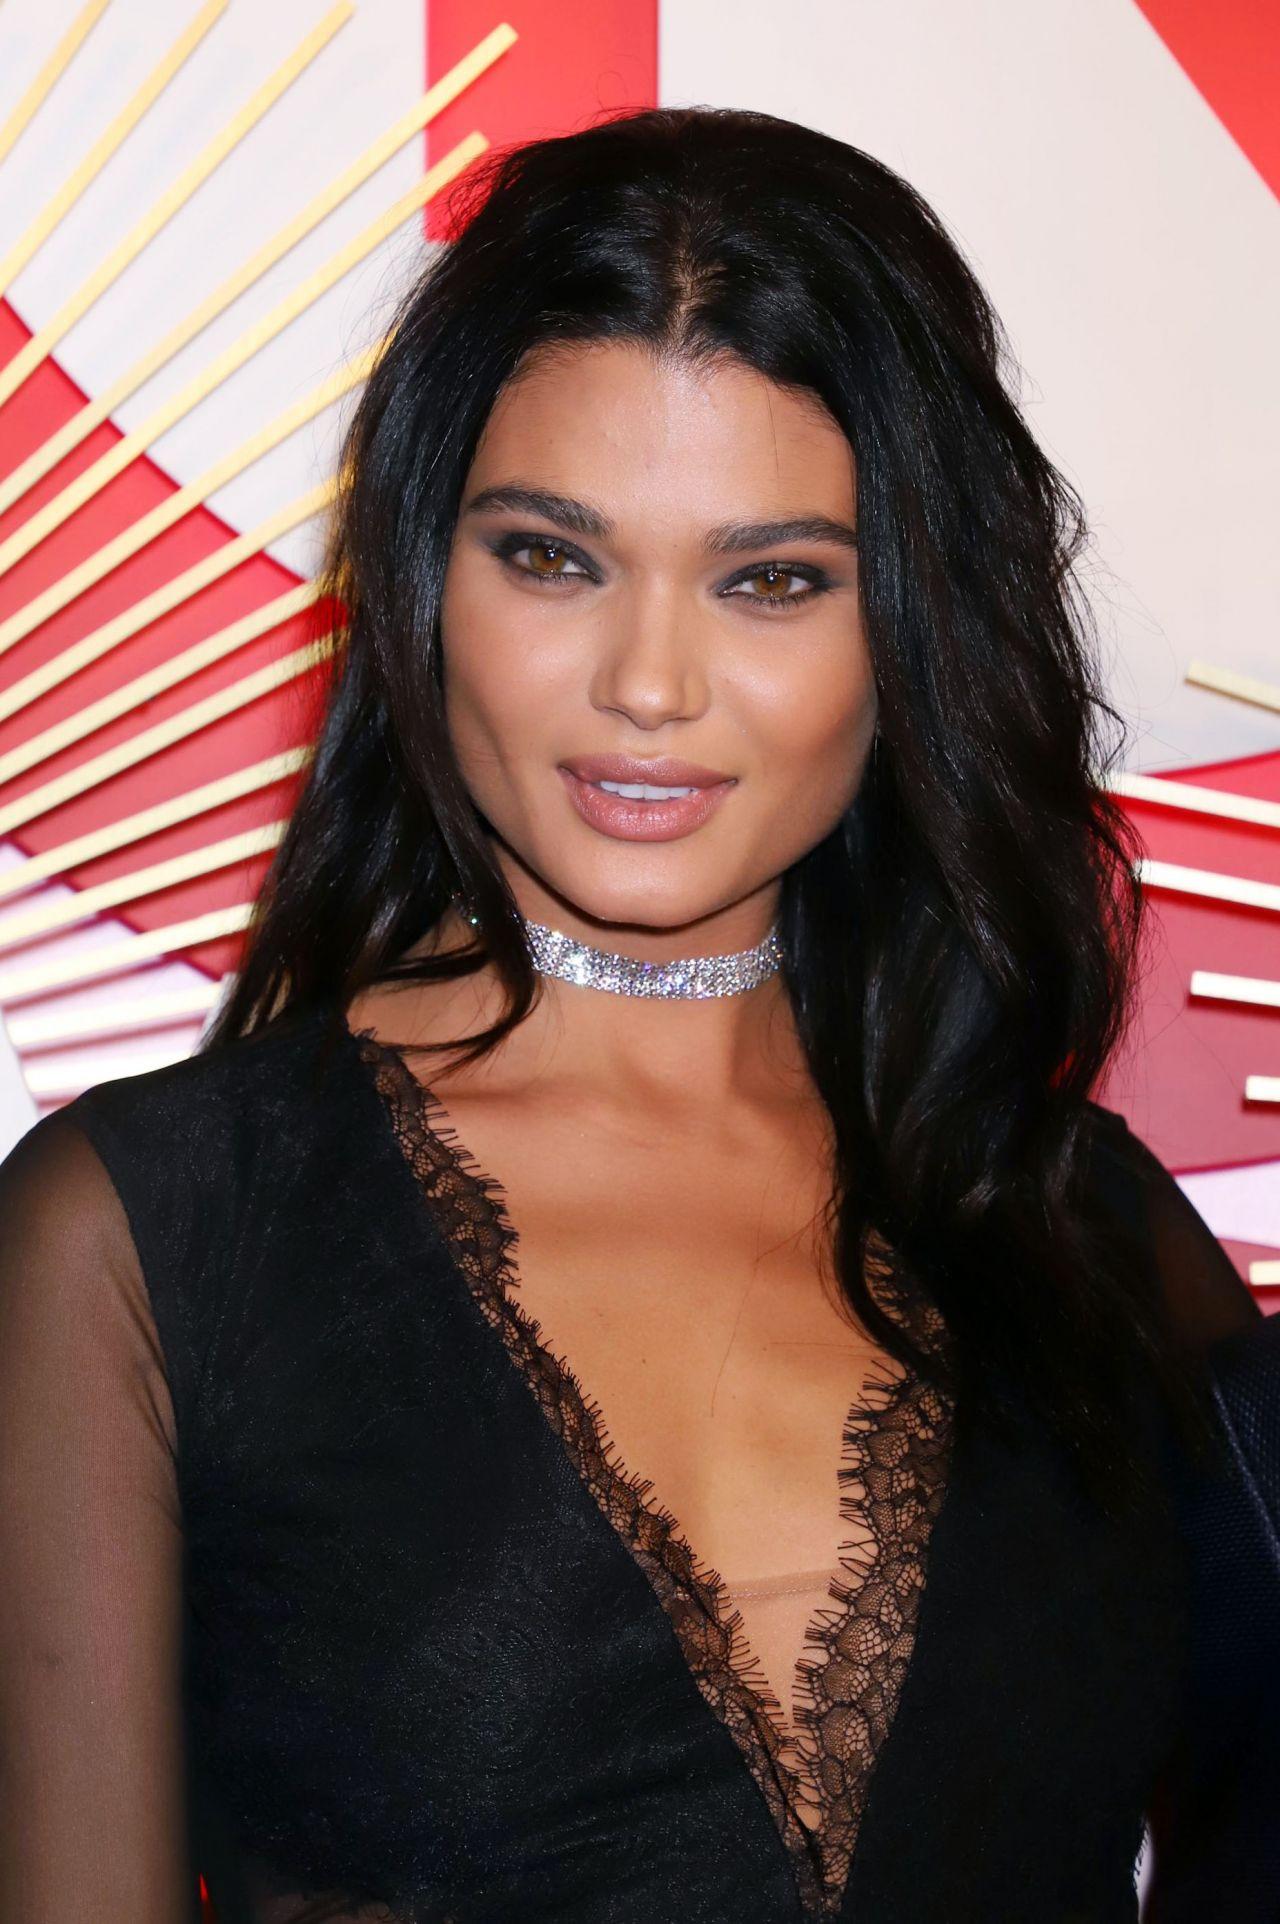 Celebrity Daniela Braga nudes (44 images), Bikini